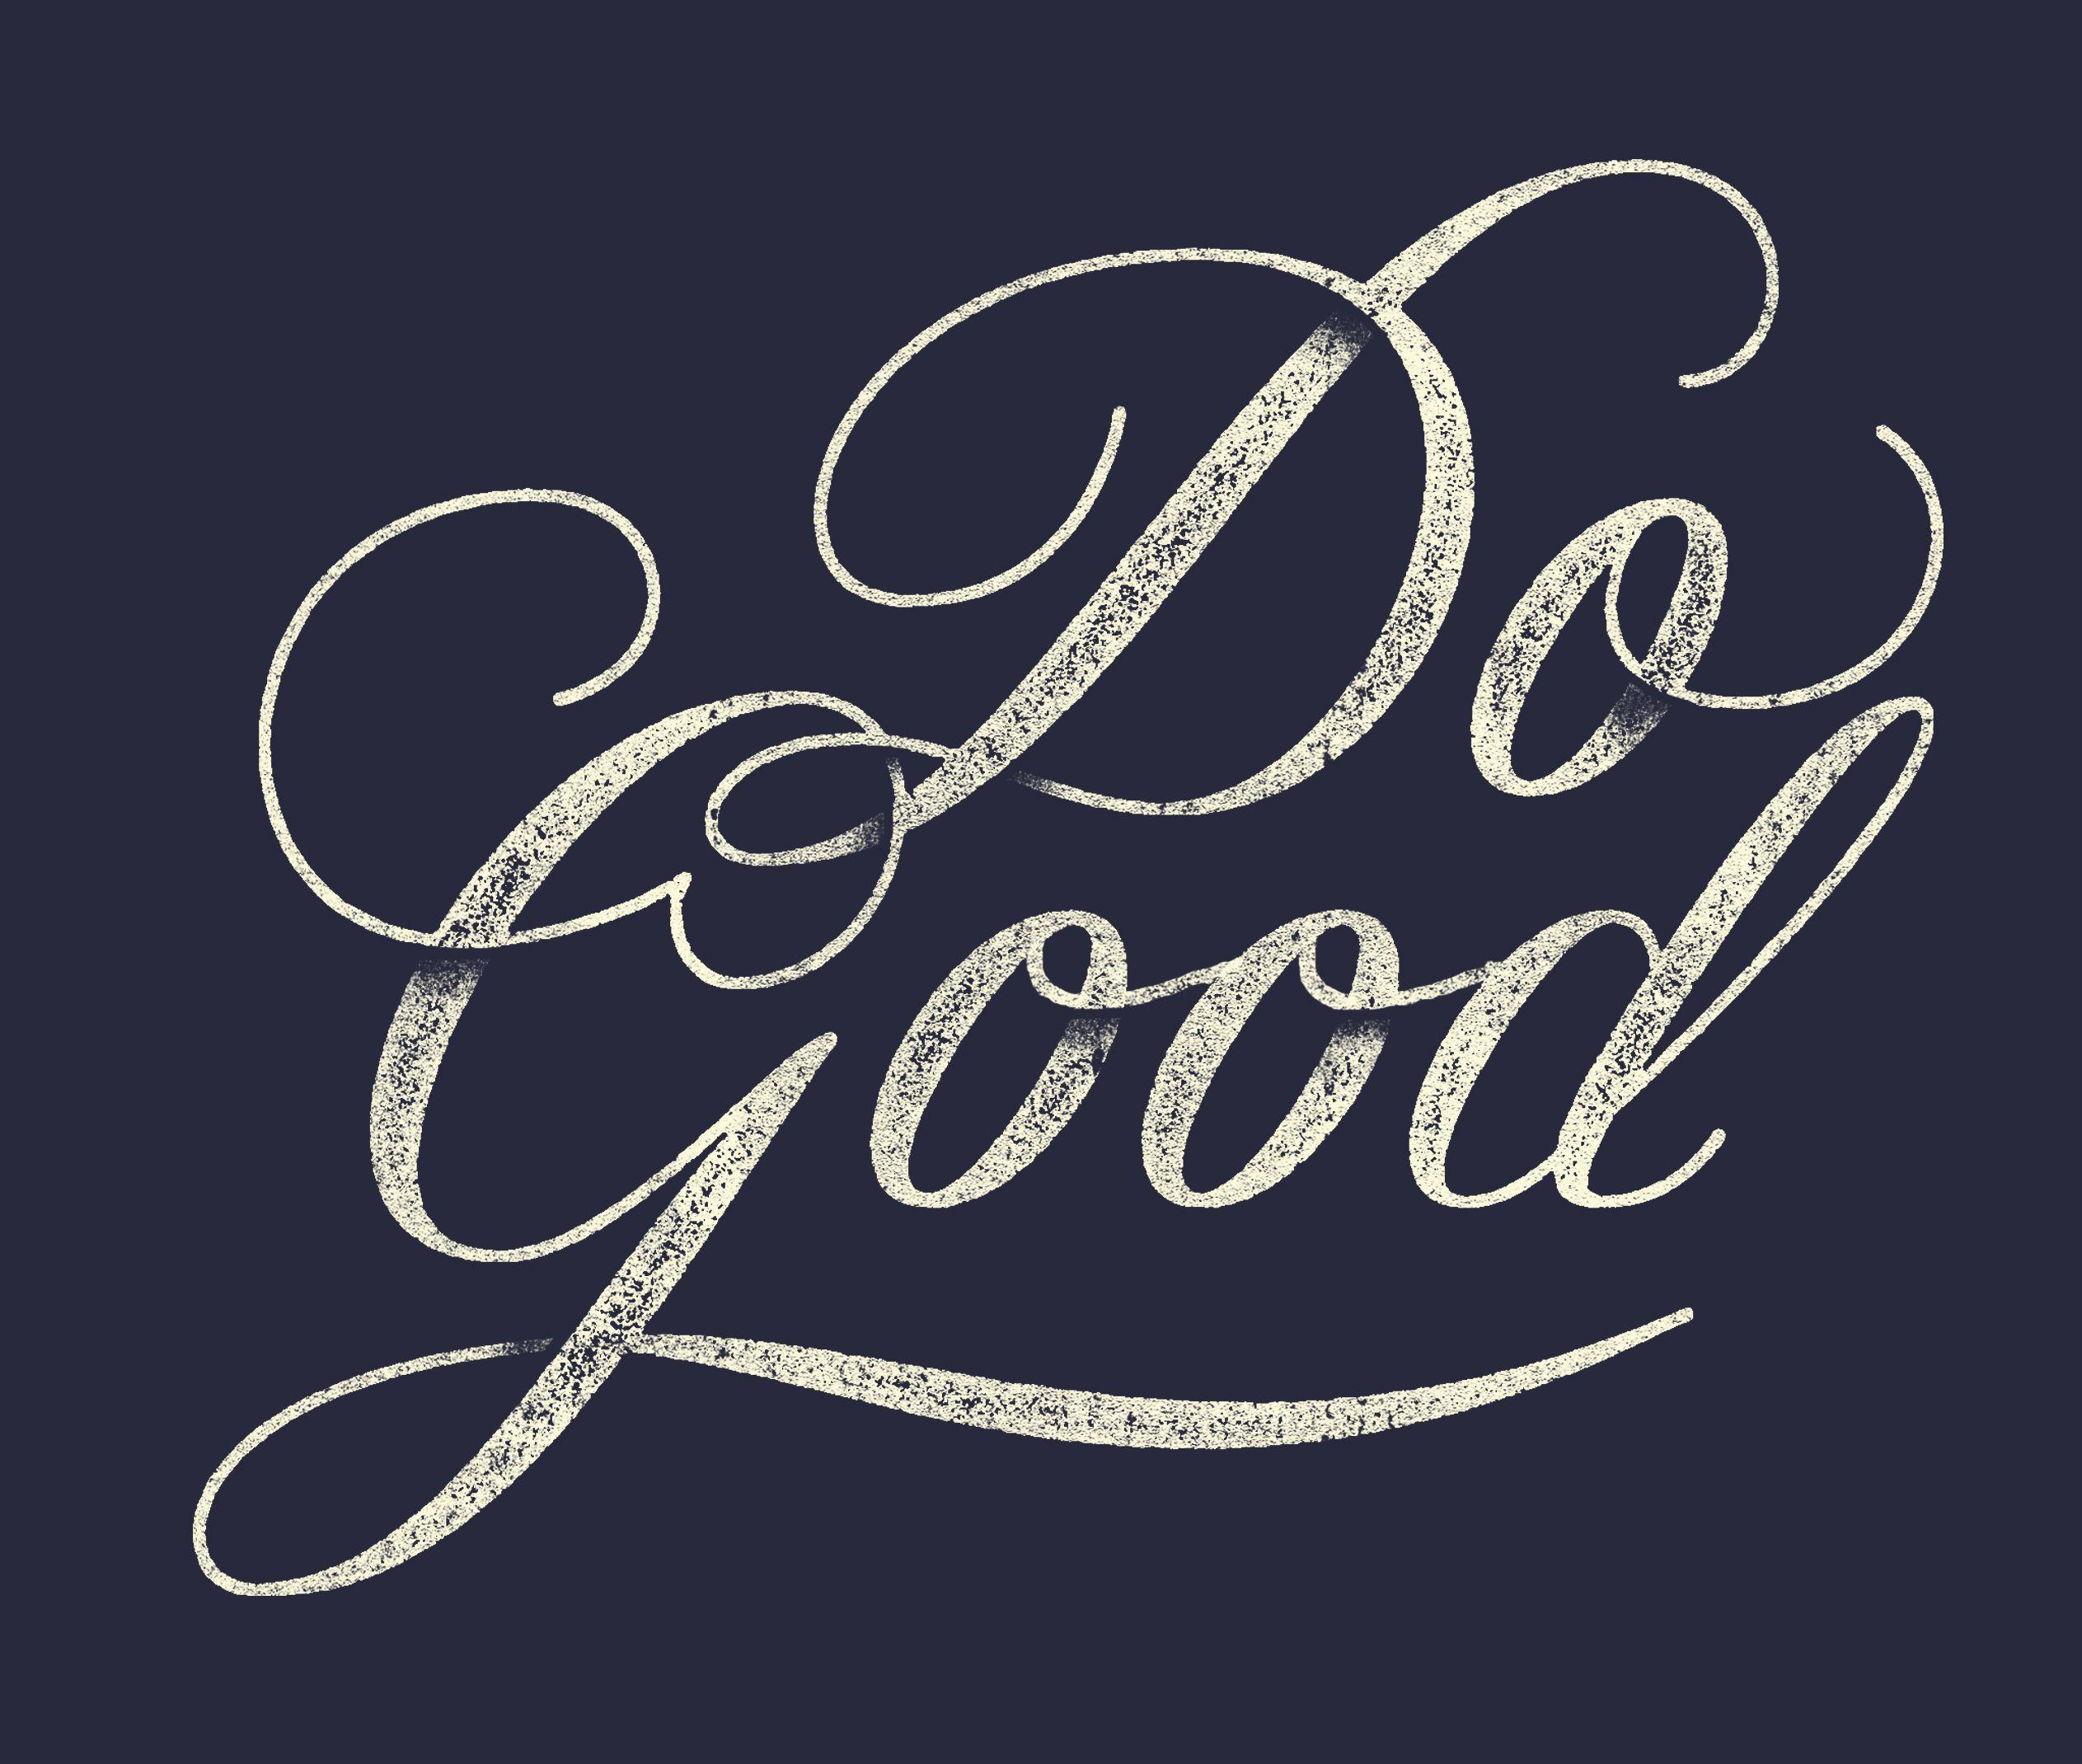 Do good by zachary smith inspiring design pinterest